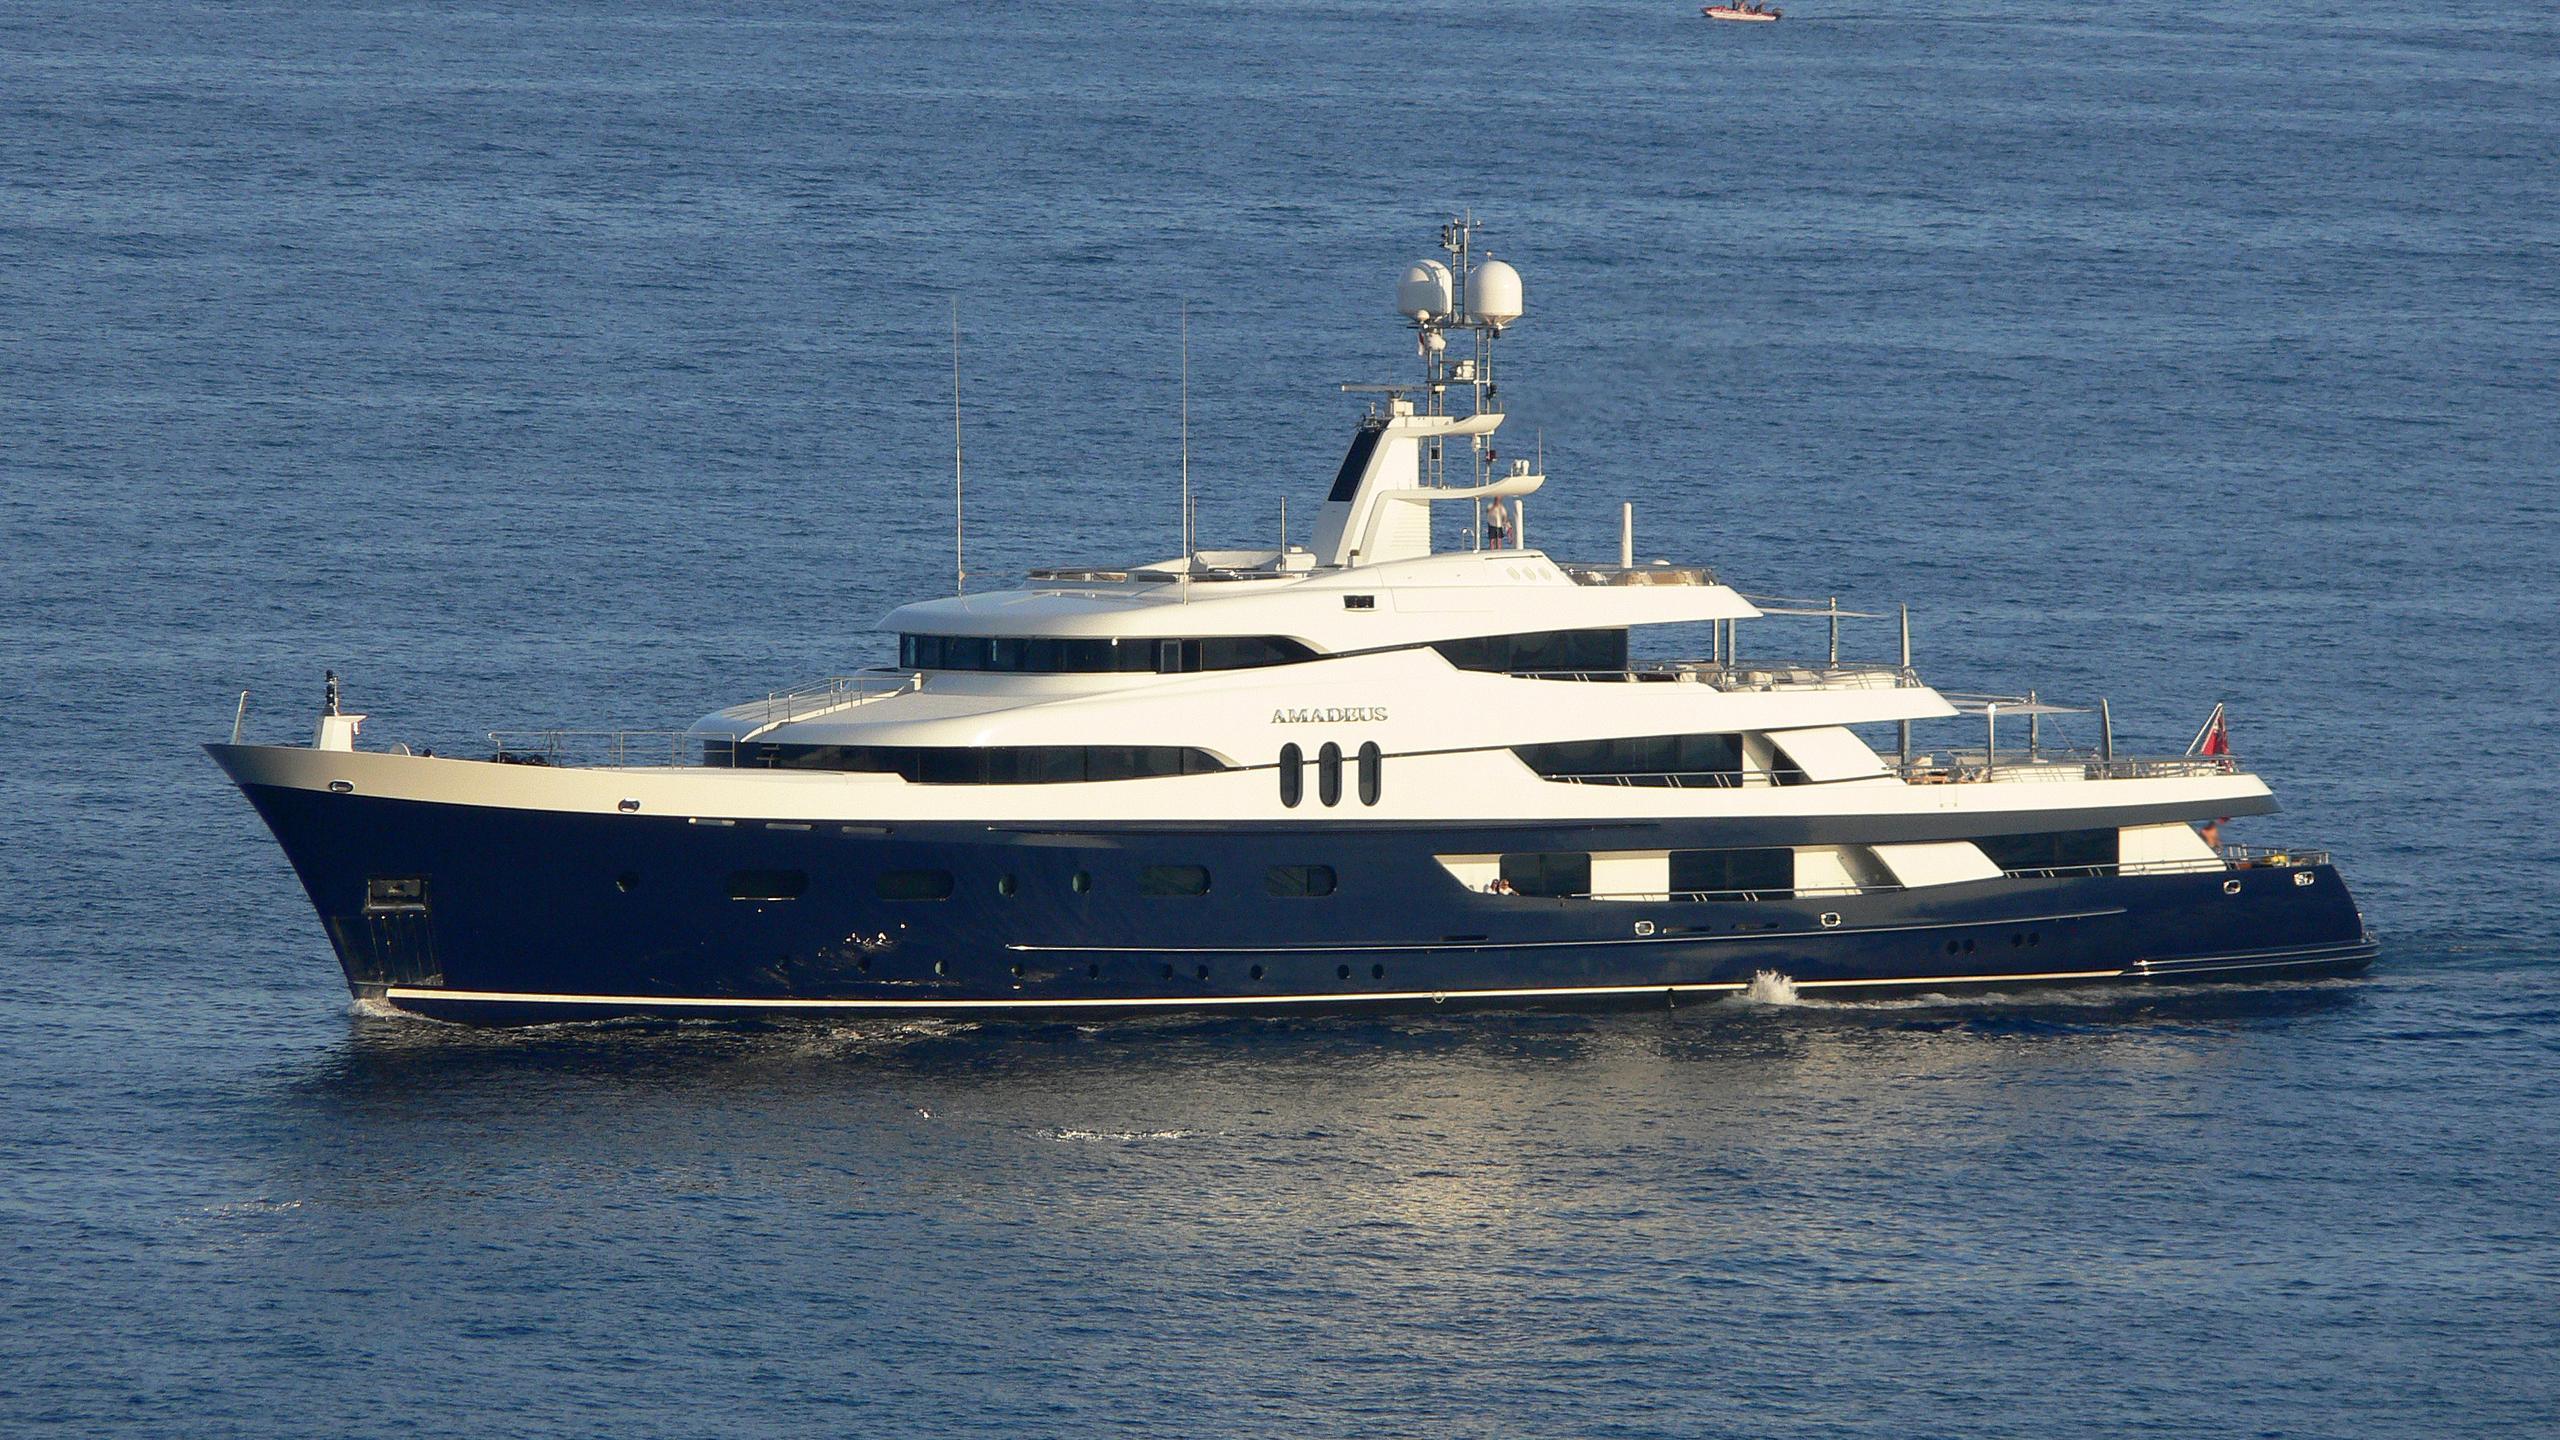 felix-motor-yacht-amadeus-1969-70m-running-profile